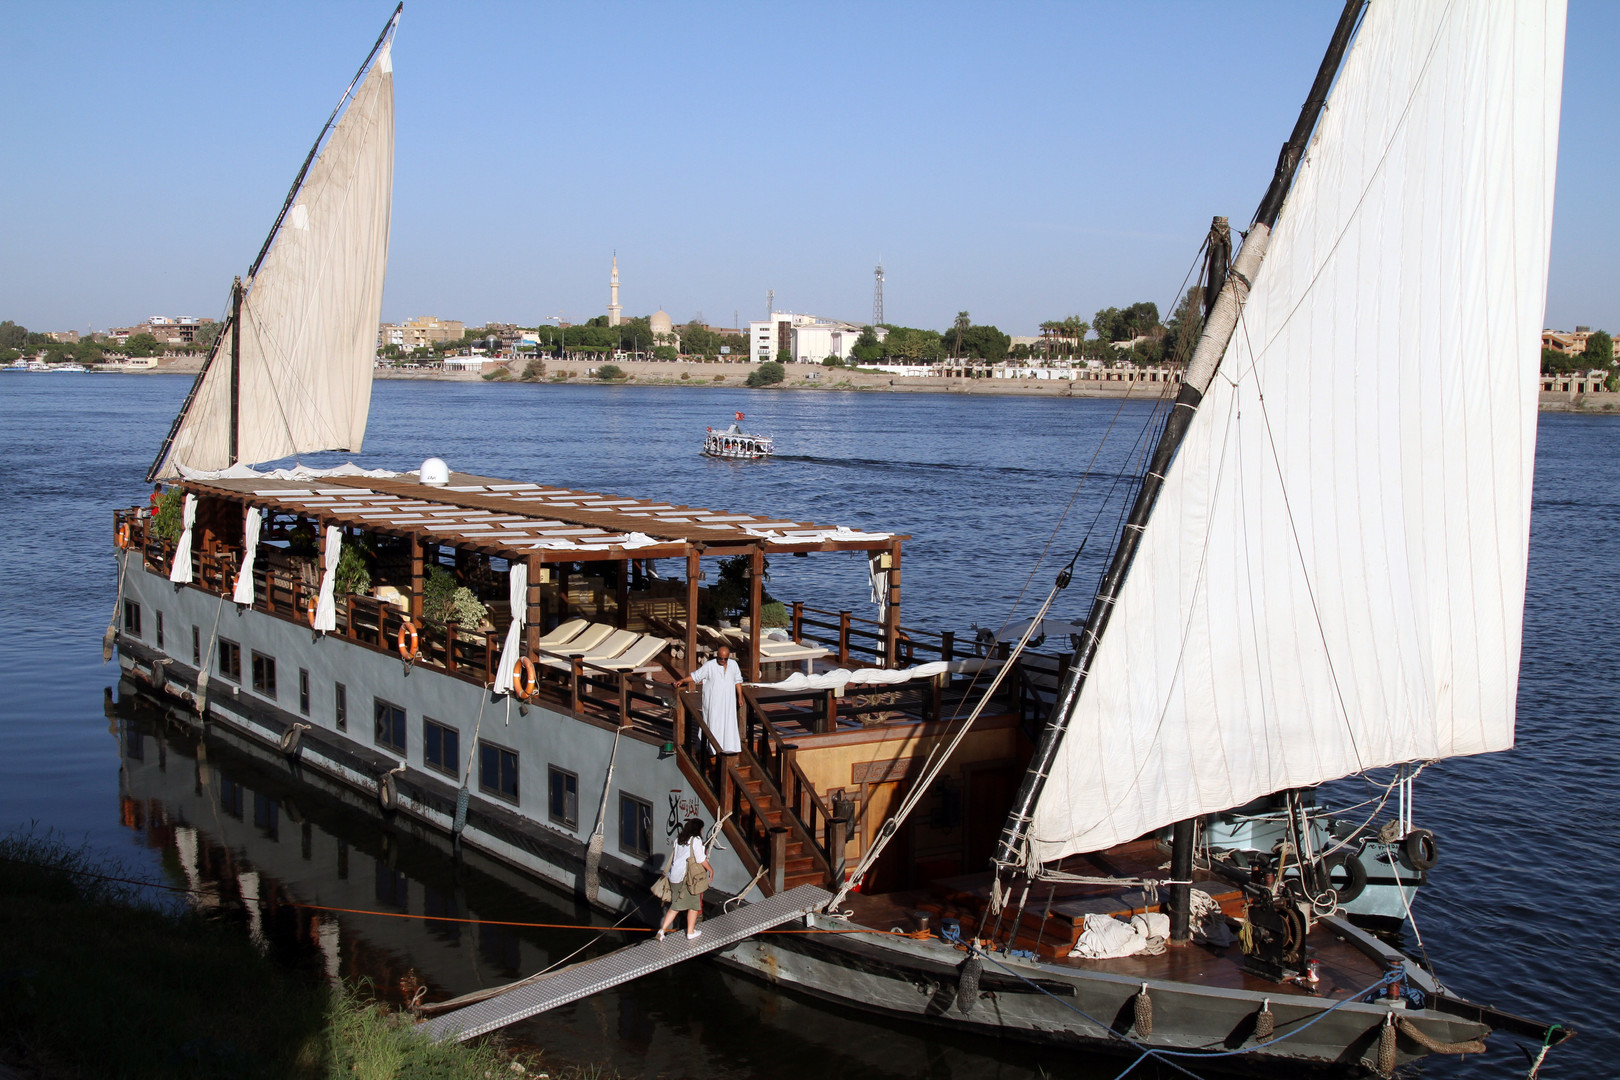 Nile0.28.jpg